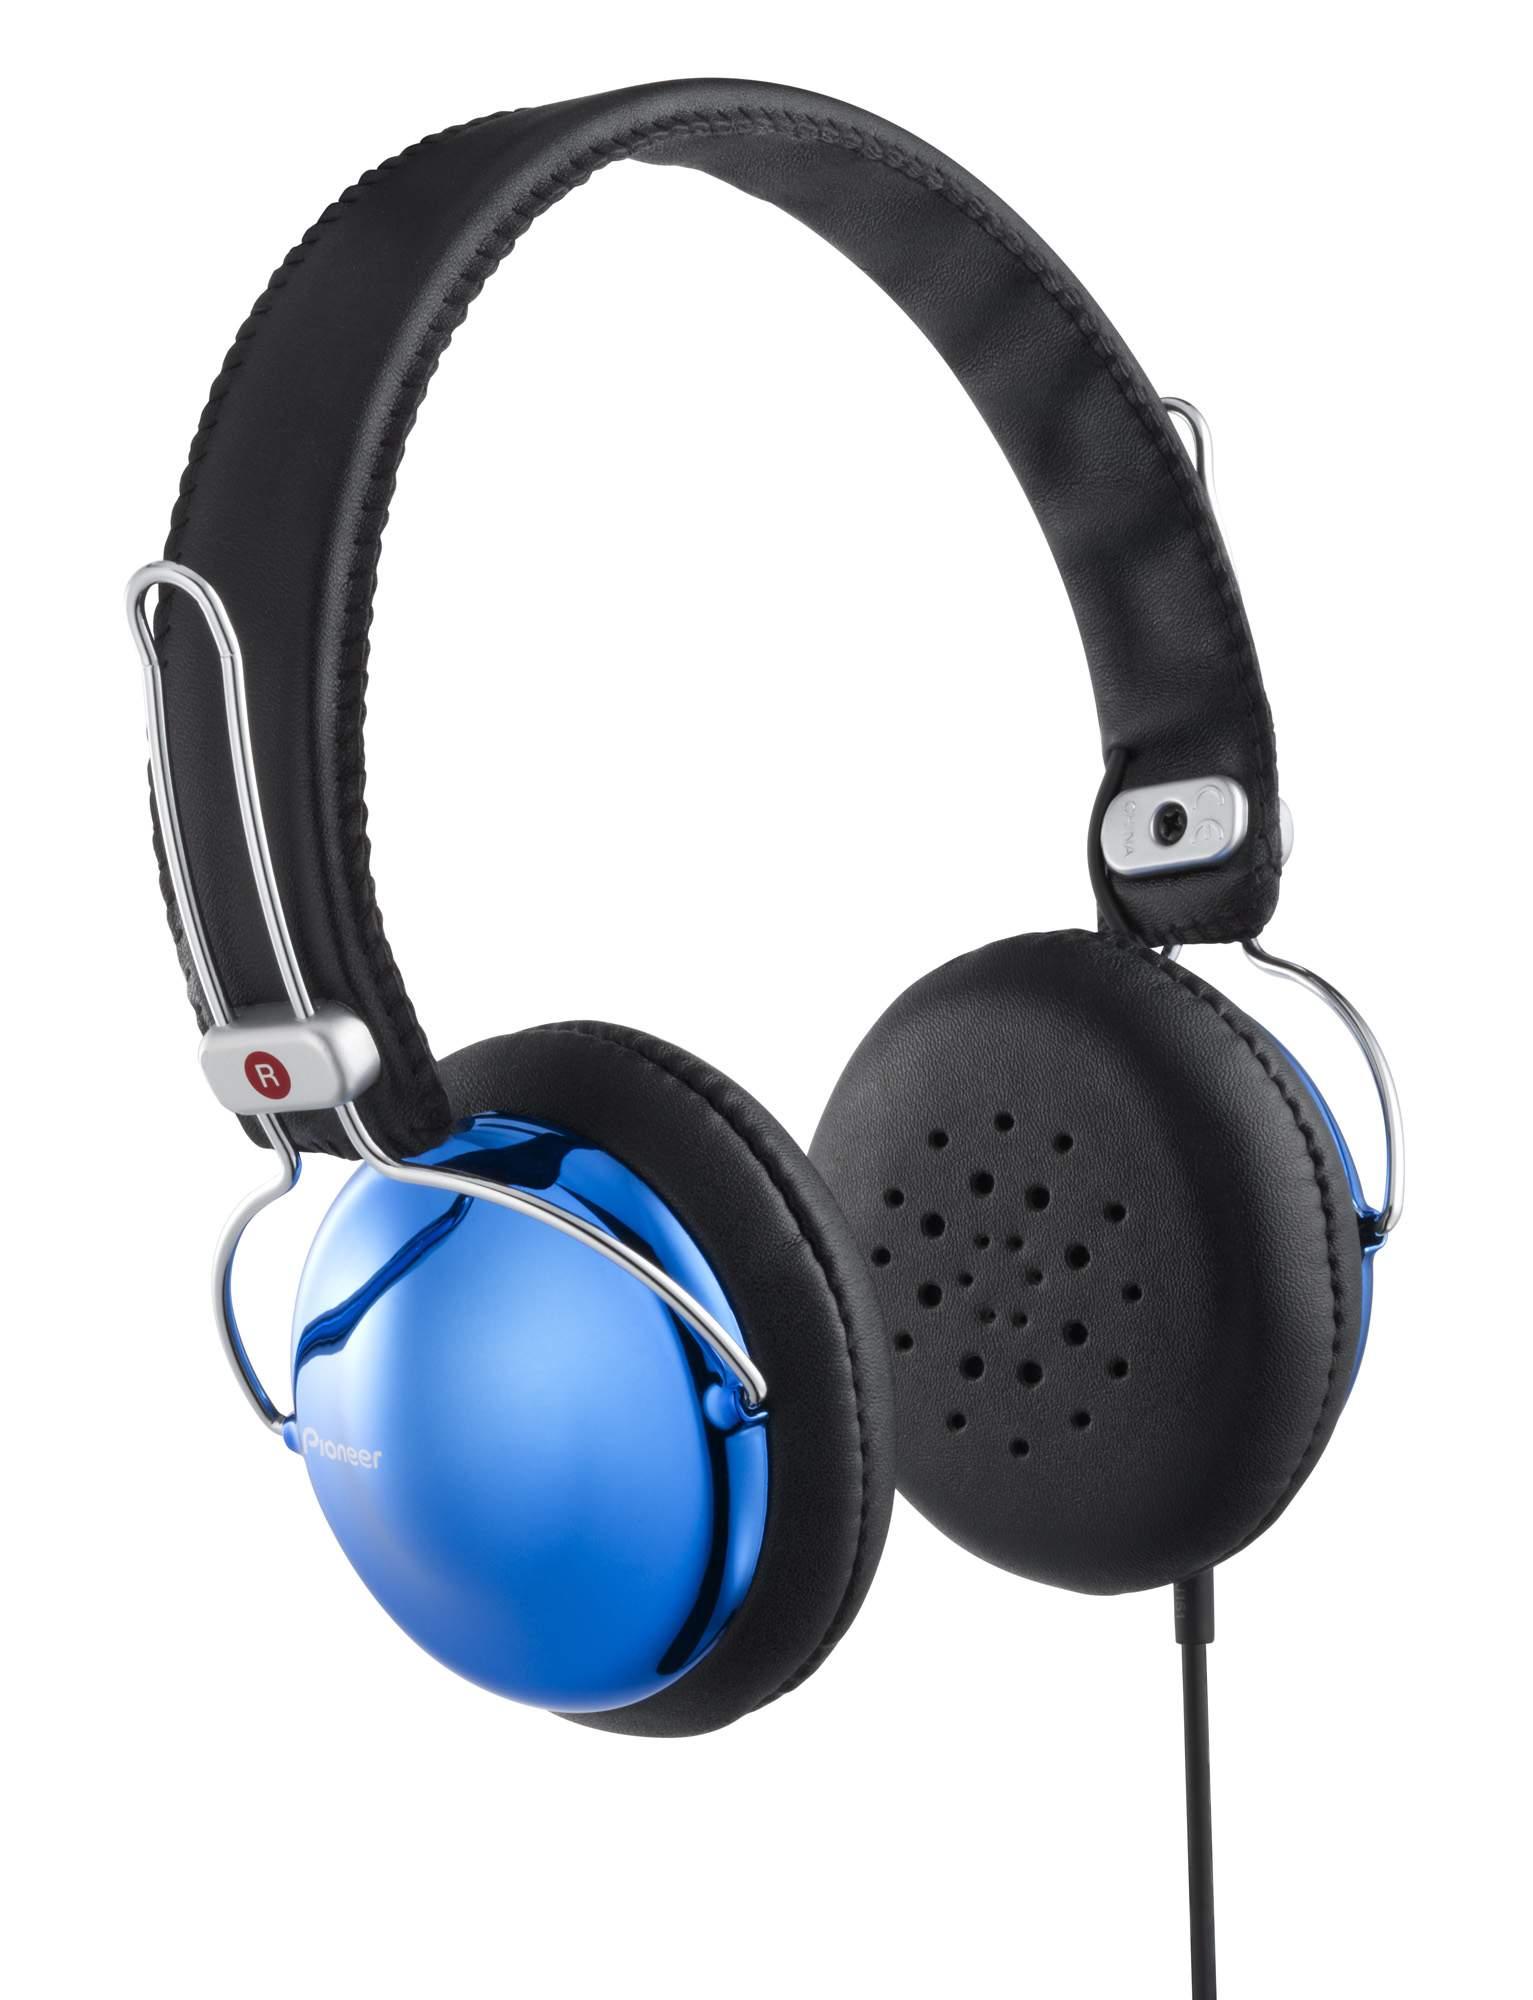 Neo Retro 時尚新定番‧Pioneer高音質造型耳機